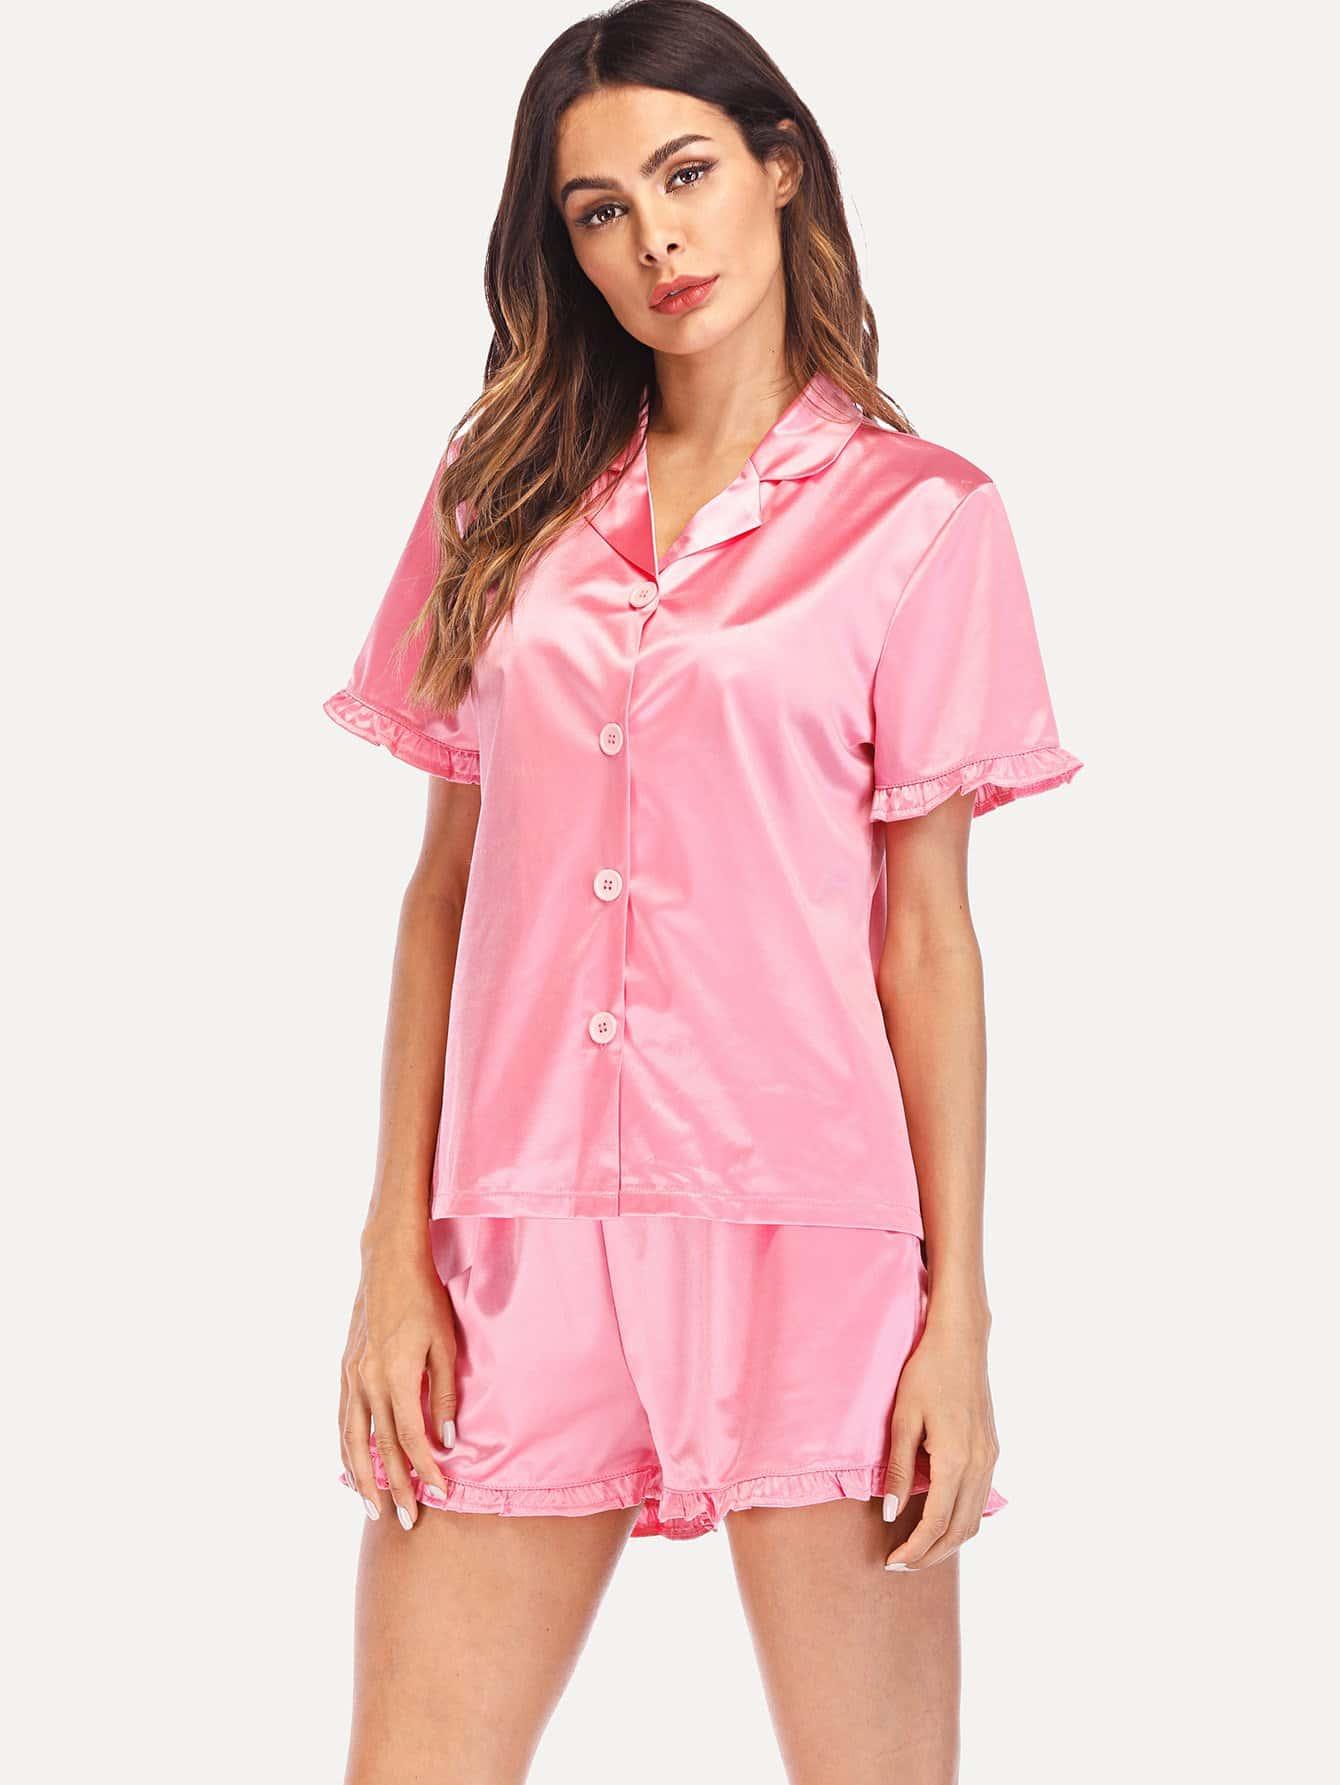 Frill Trim Shirt & Shorts PJ Set frill trim shirt